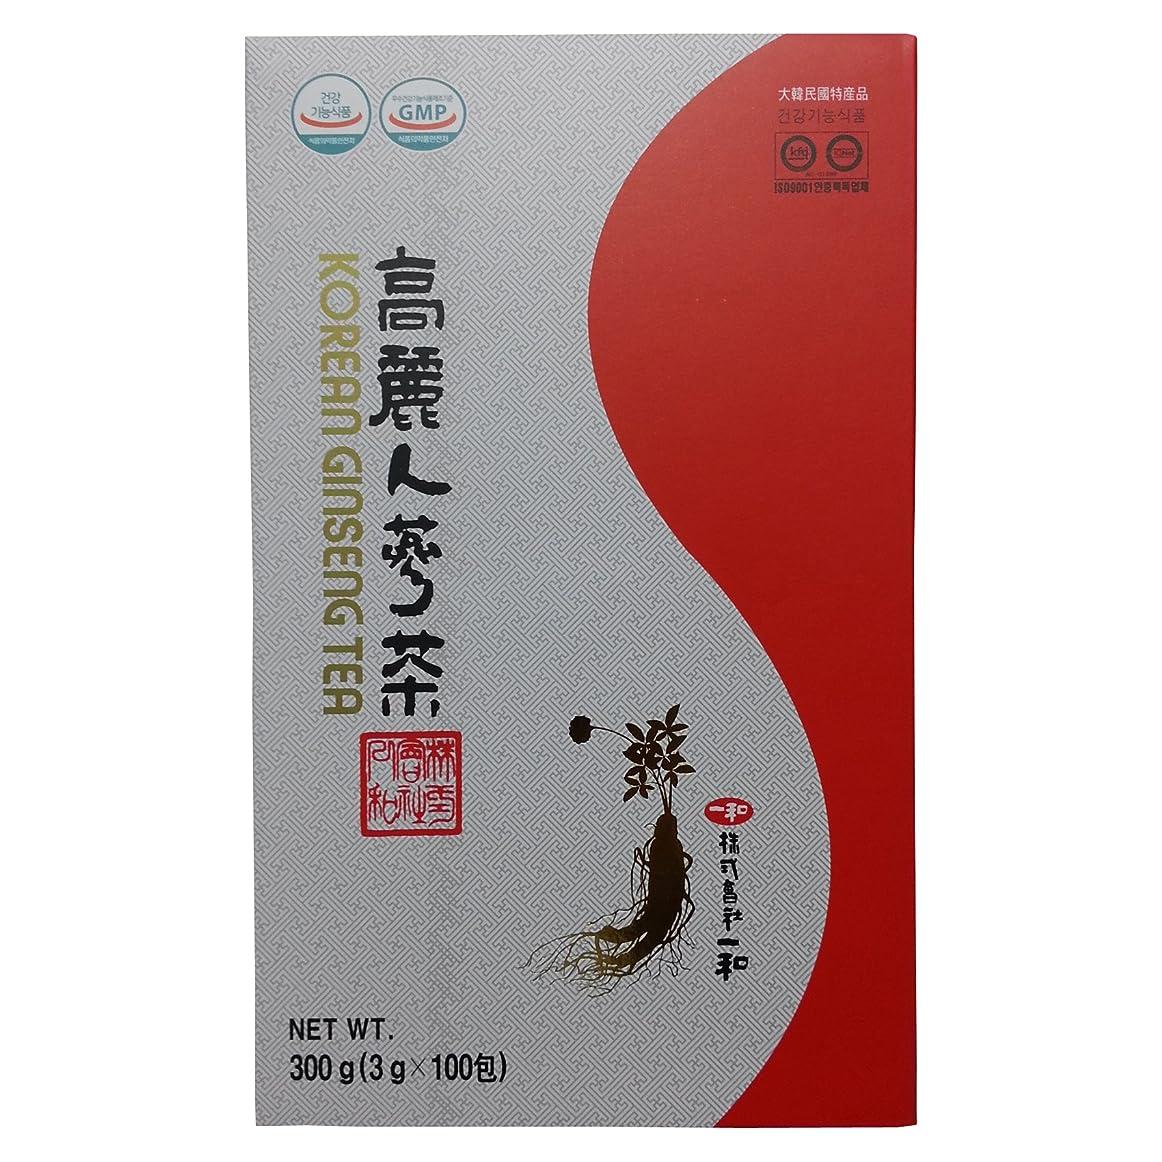 検索ジャンクション農場高麗人参 一和高麗人参茶 6年根 3g×100包 [並行輸入品]